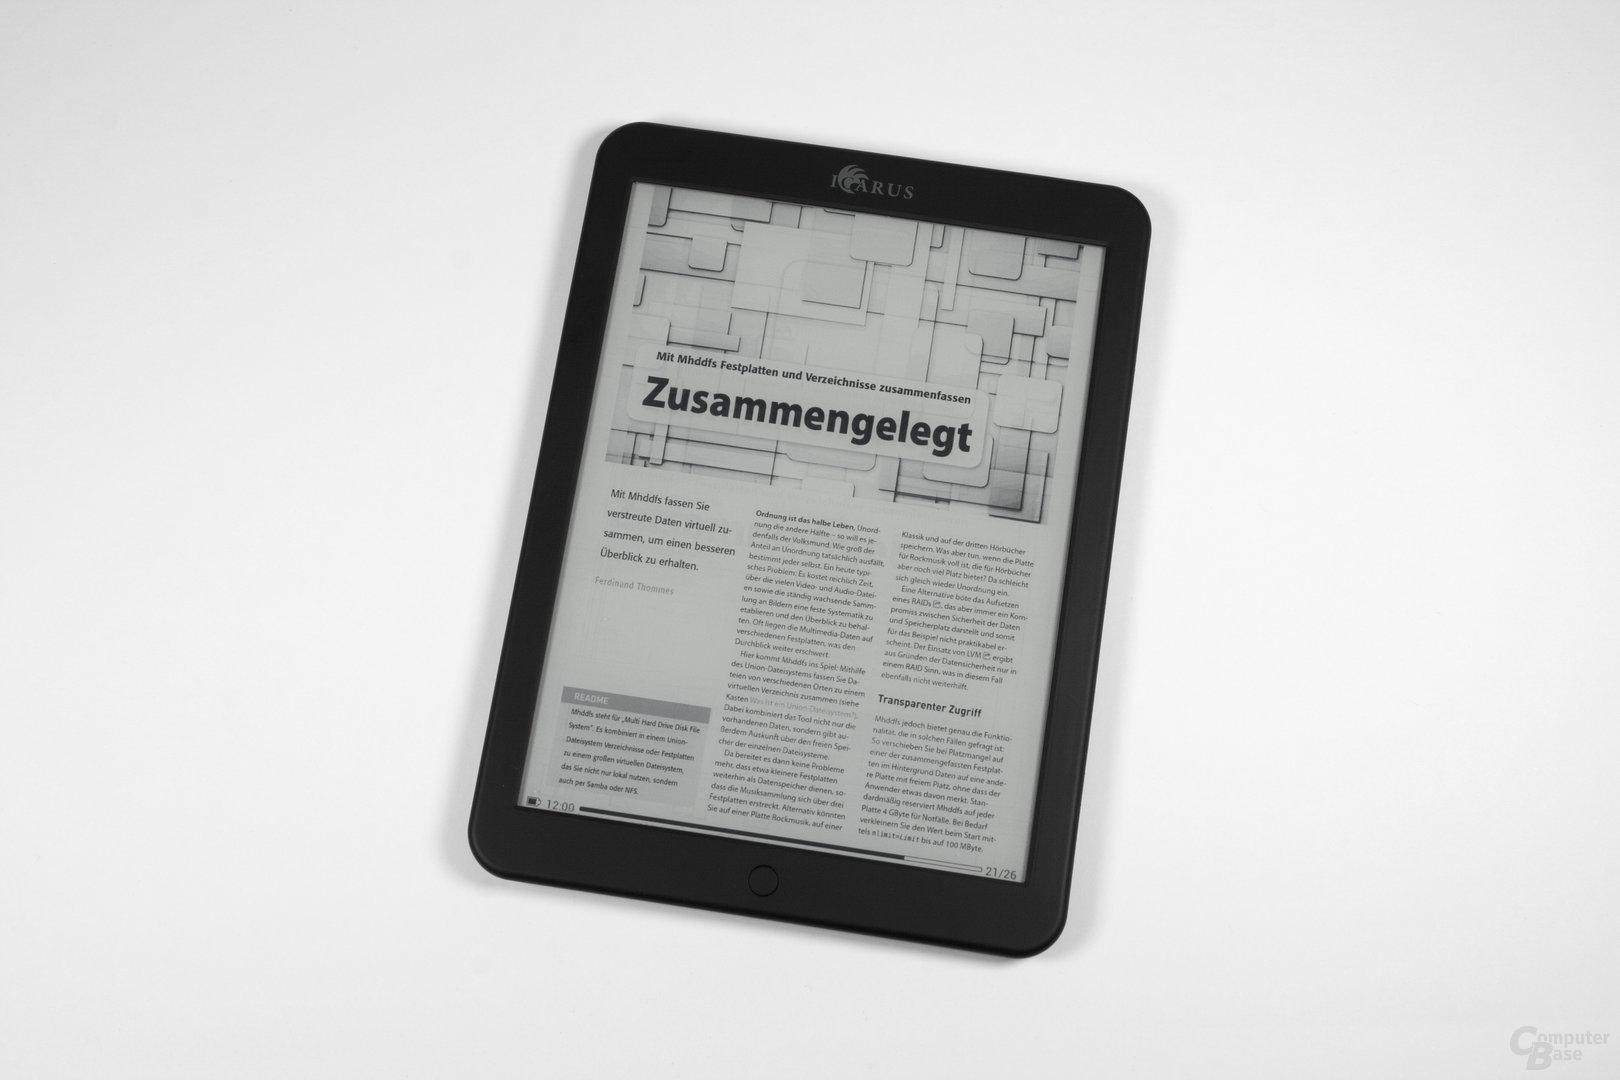 PDF-Cropping auf dem Icarus Illumina XL